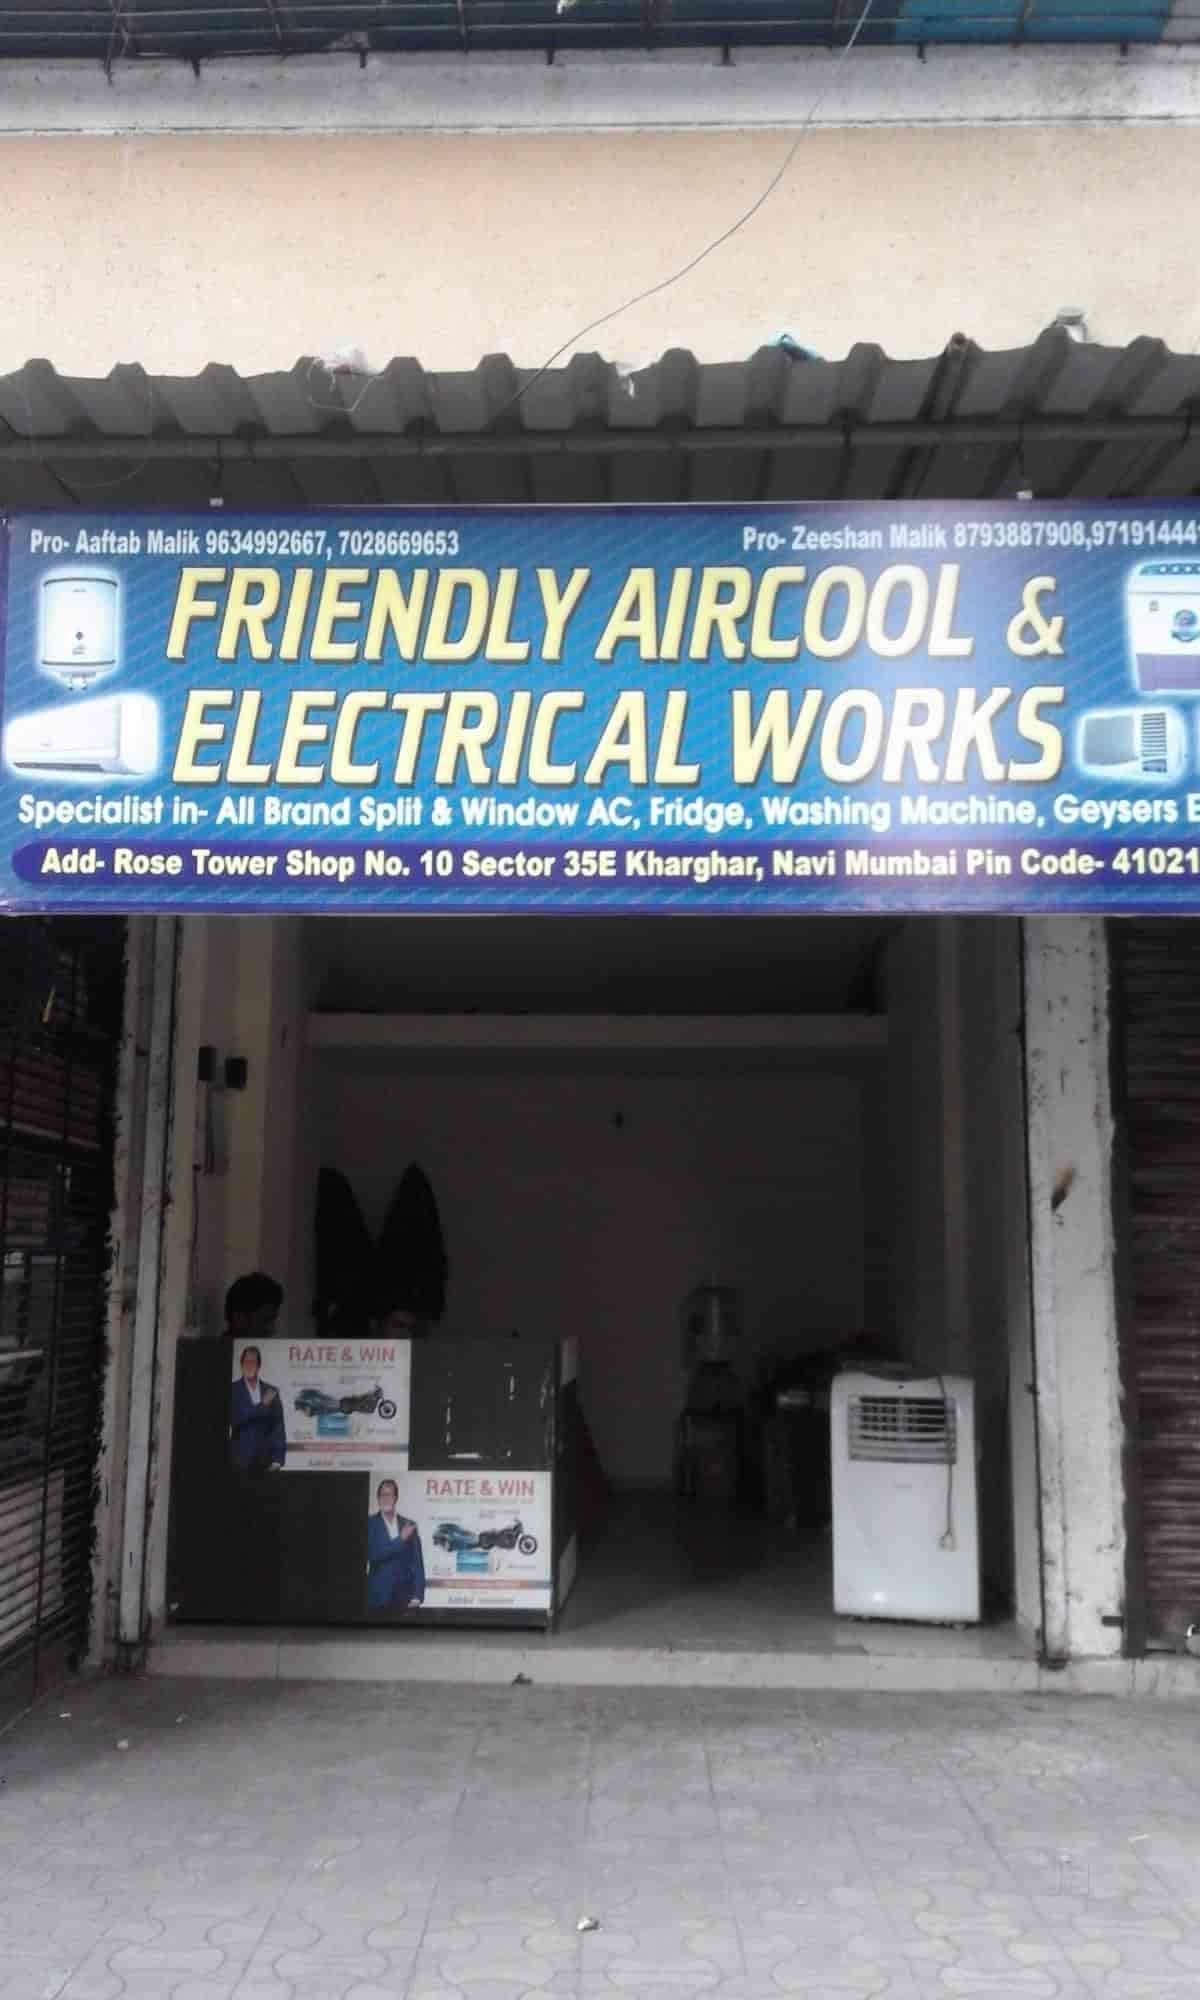 Friendly Aircool Electrical Works Photos, Kharghar, Navi